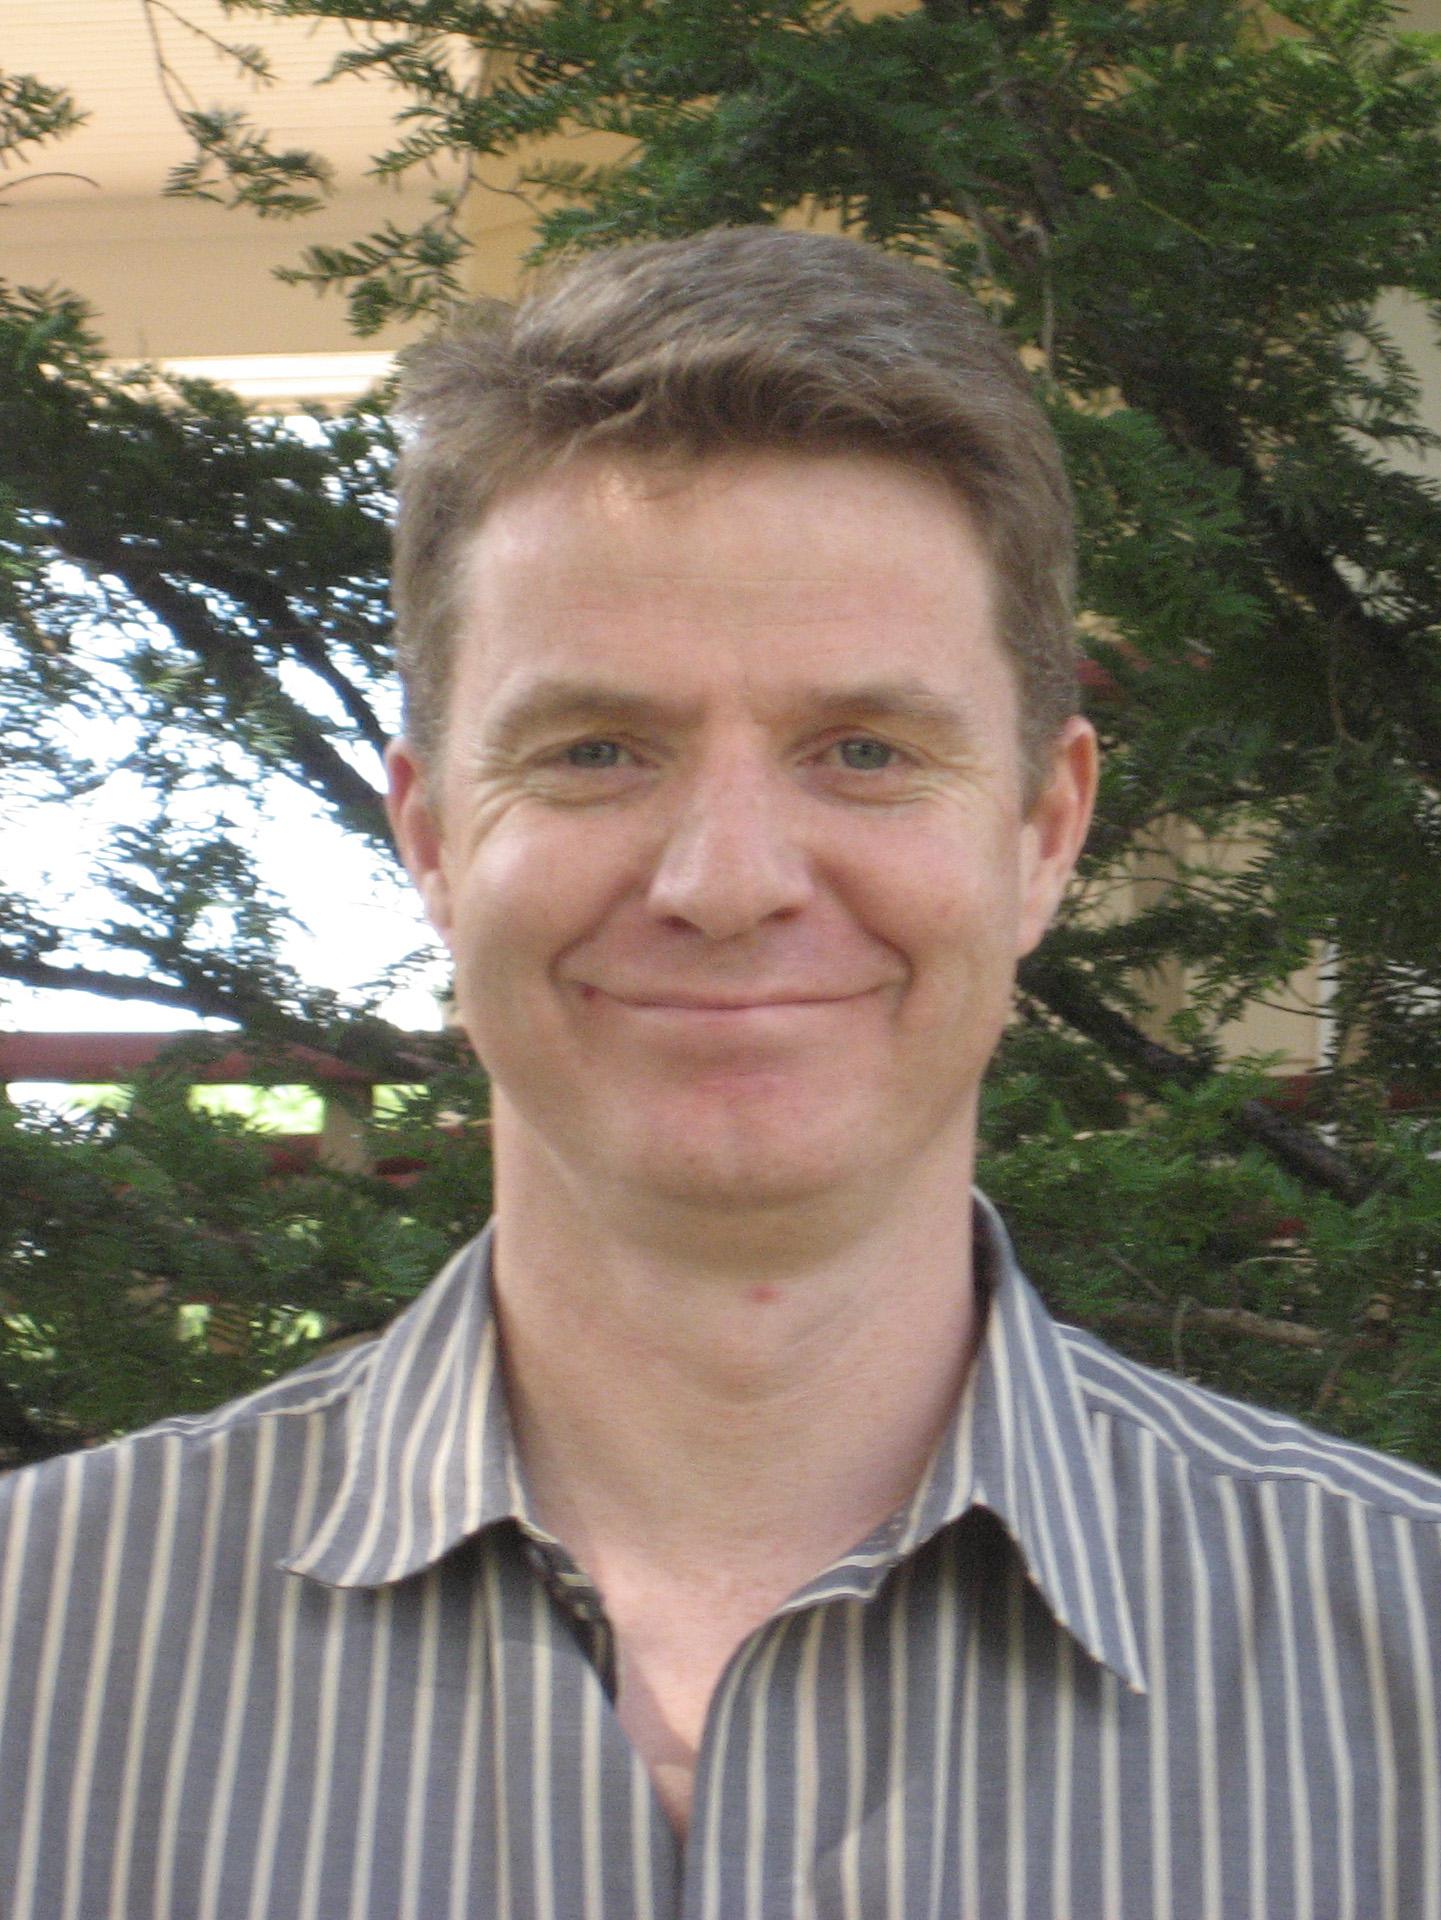 Craig Higson-Smith